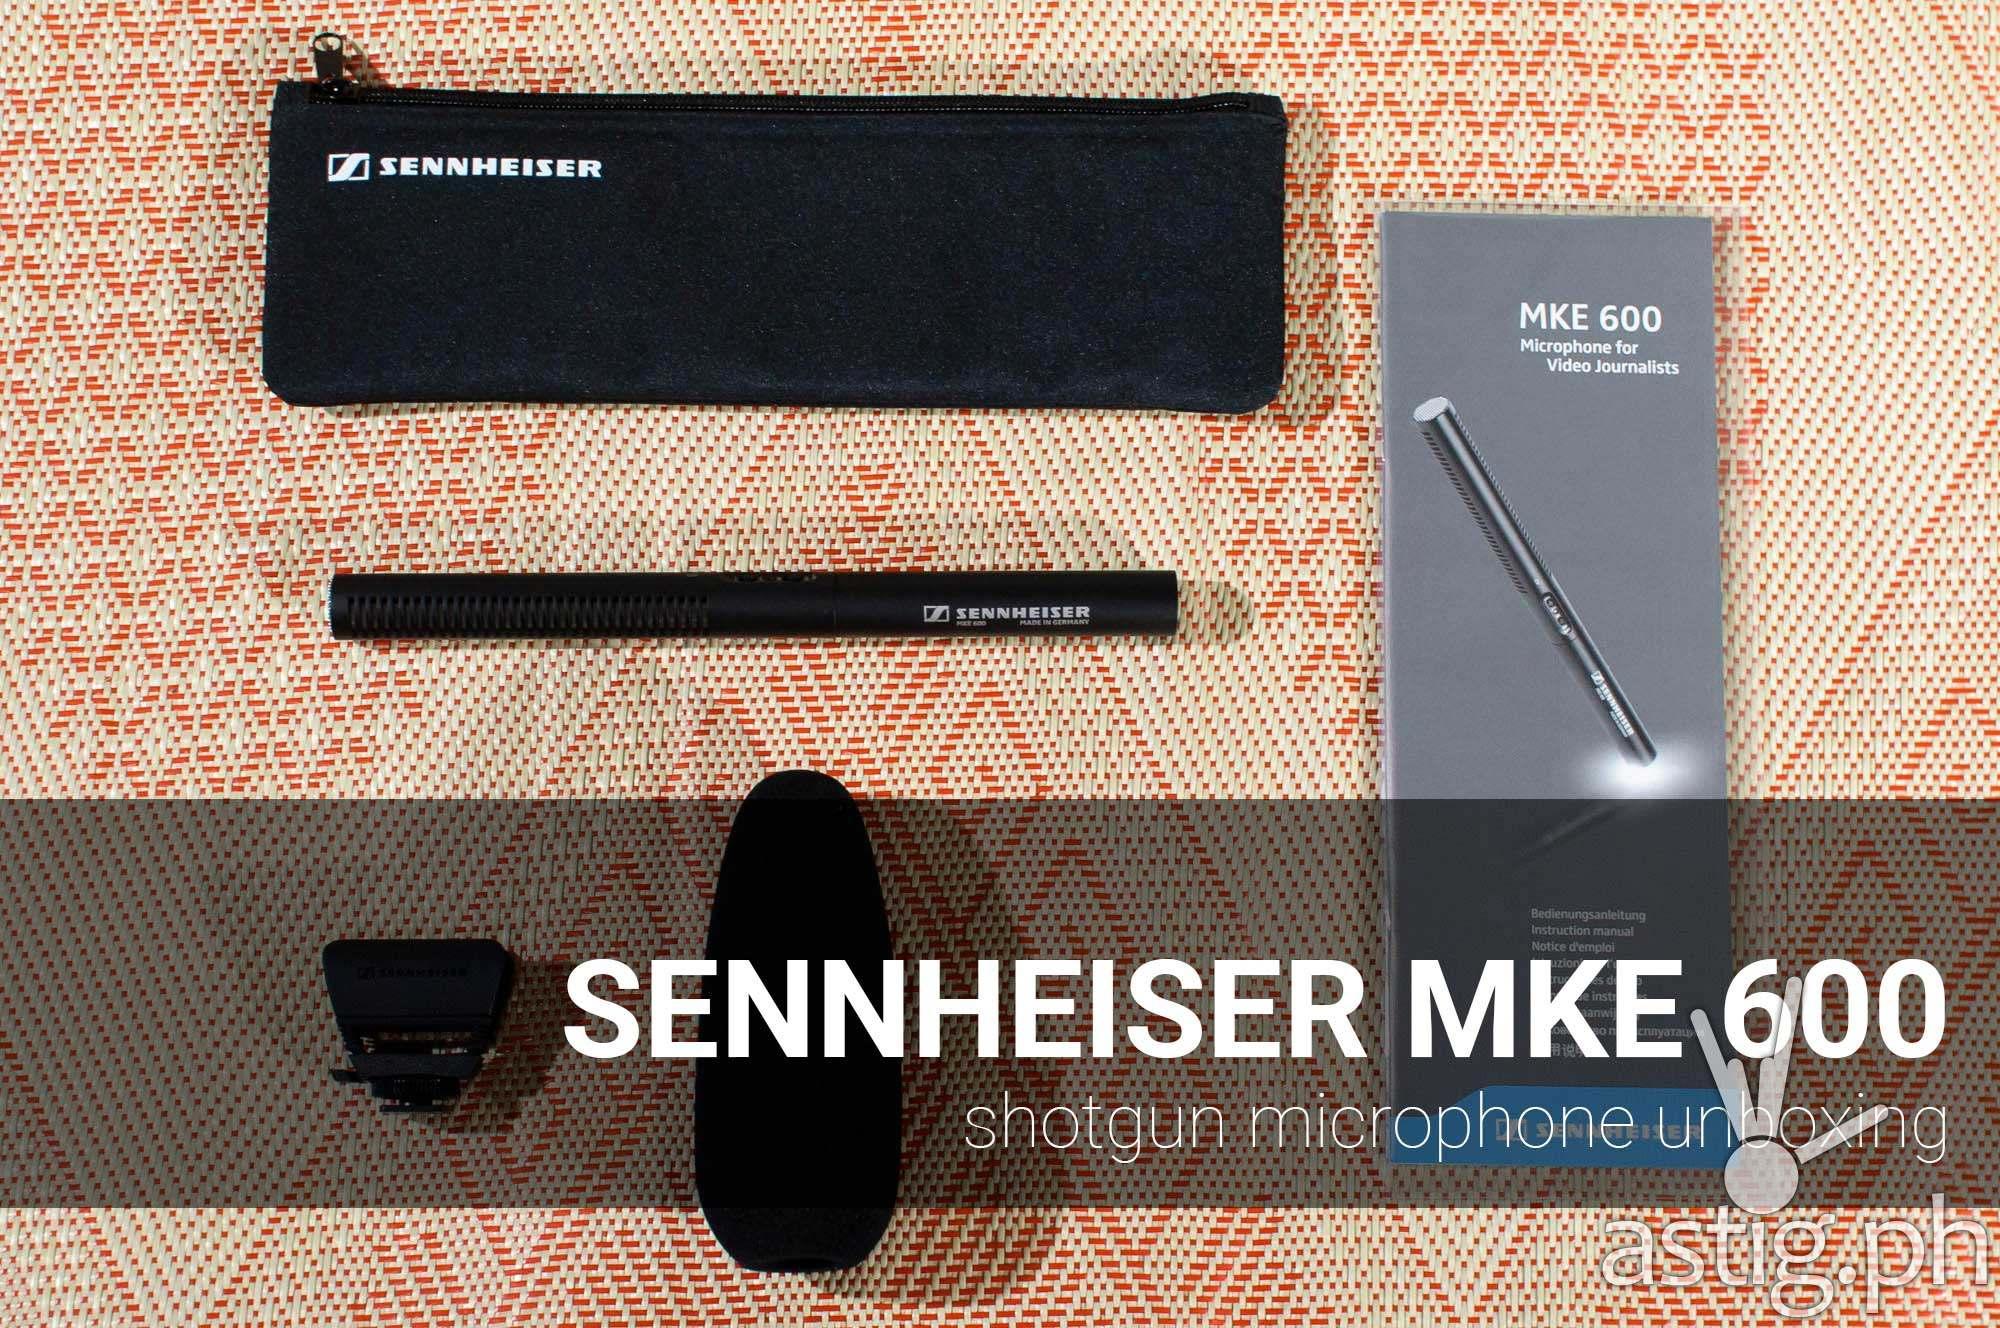 Sennheiser MKE 600 shotgun microphone unboxing